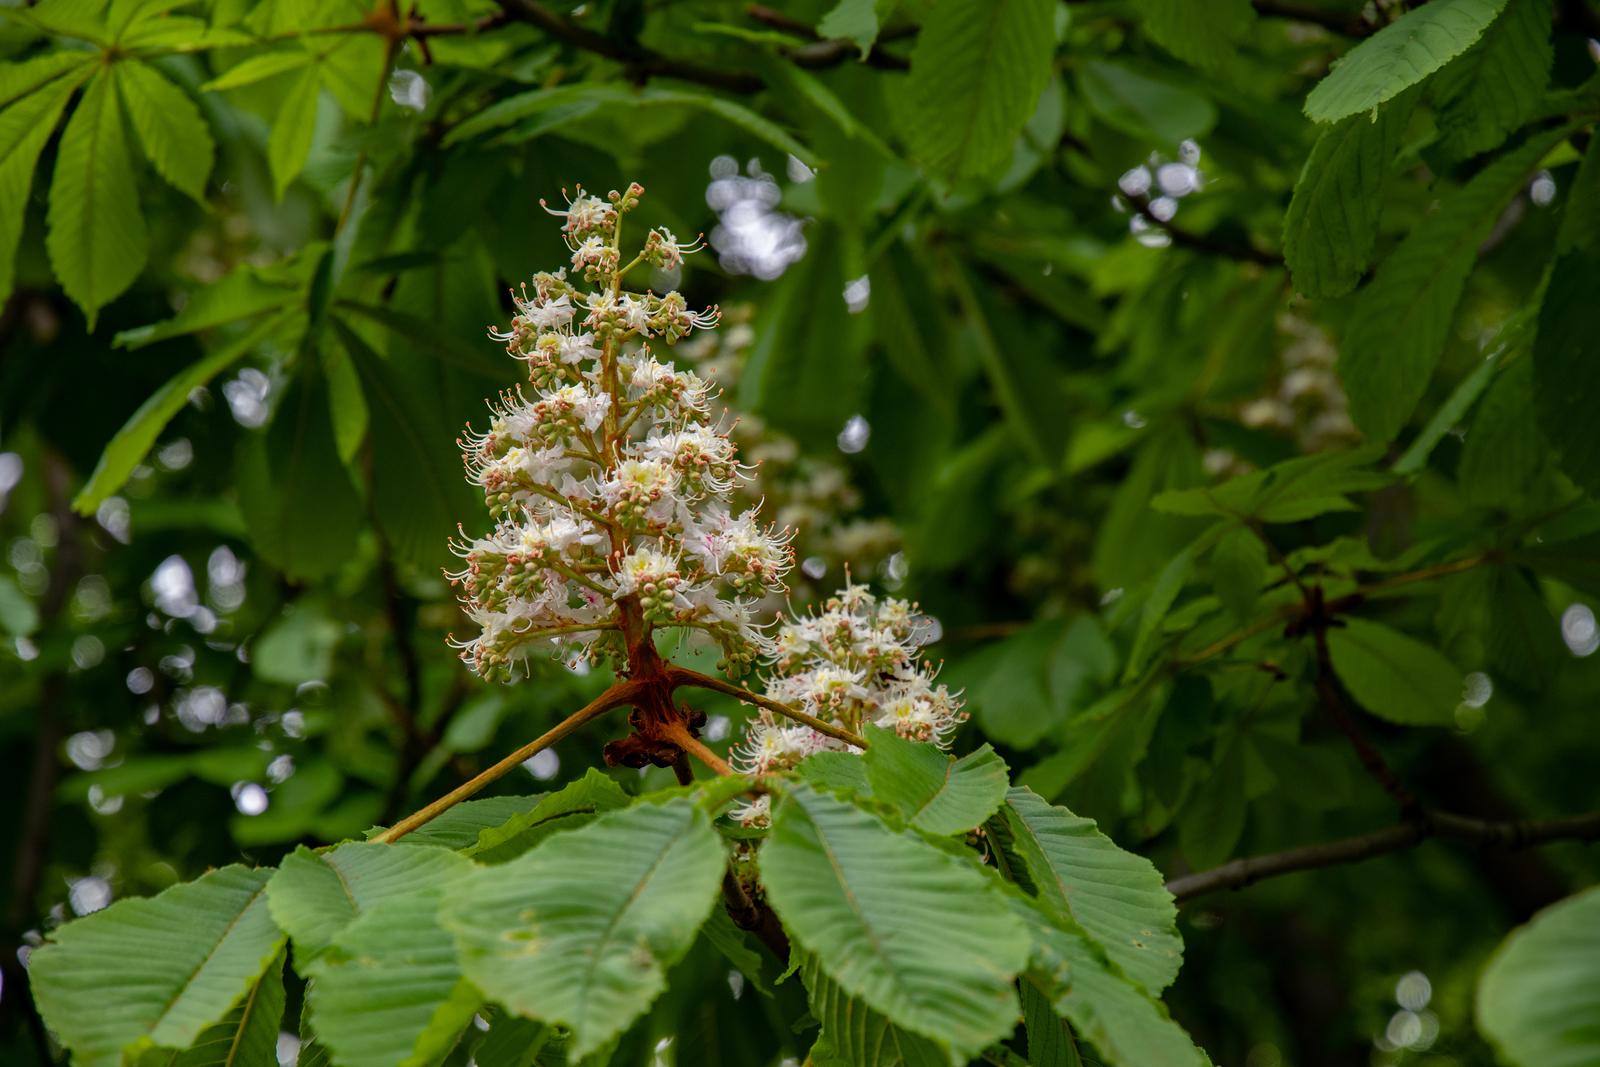 Pyramid shape white blossoms of chestnut